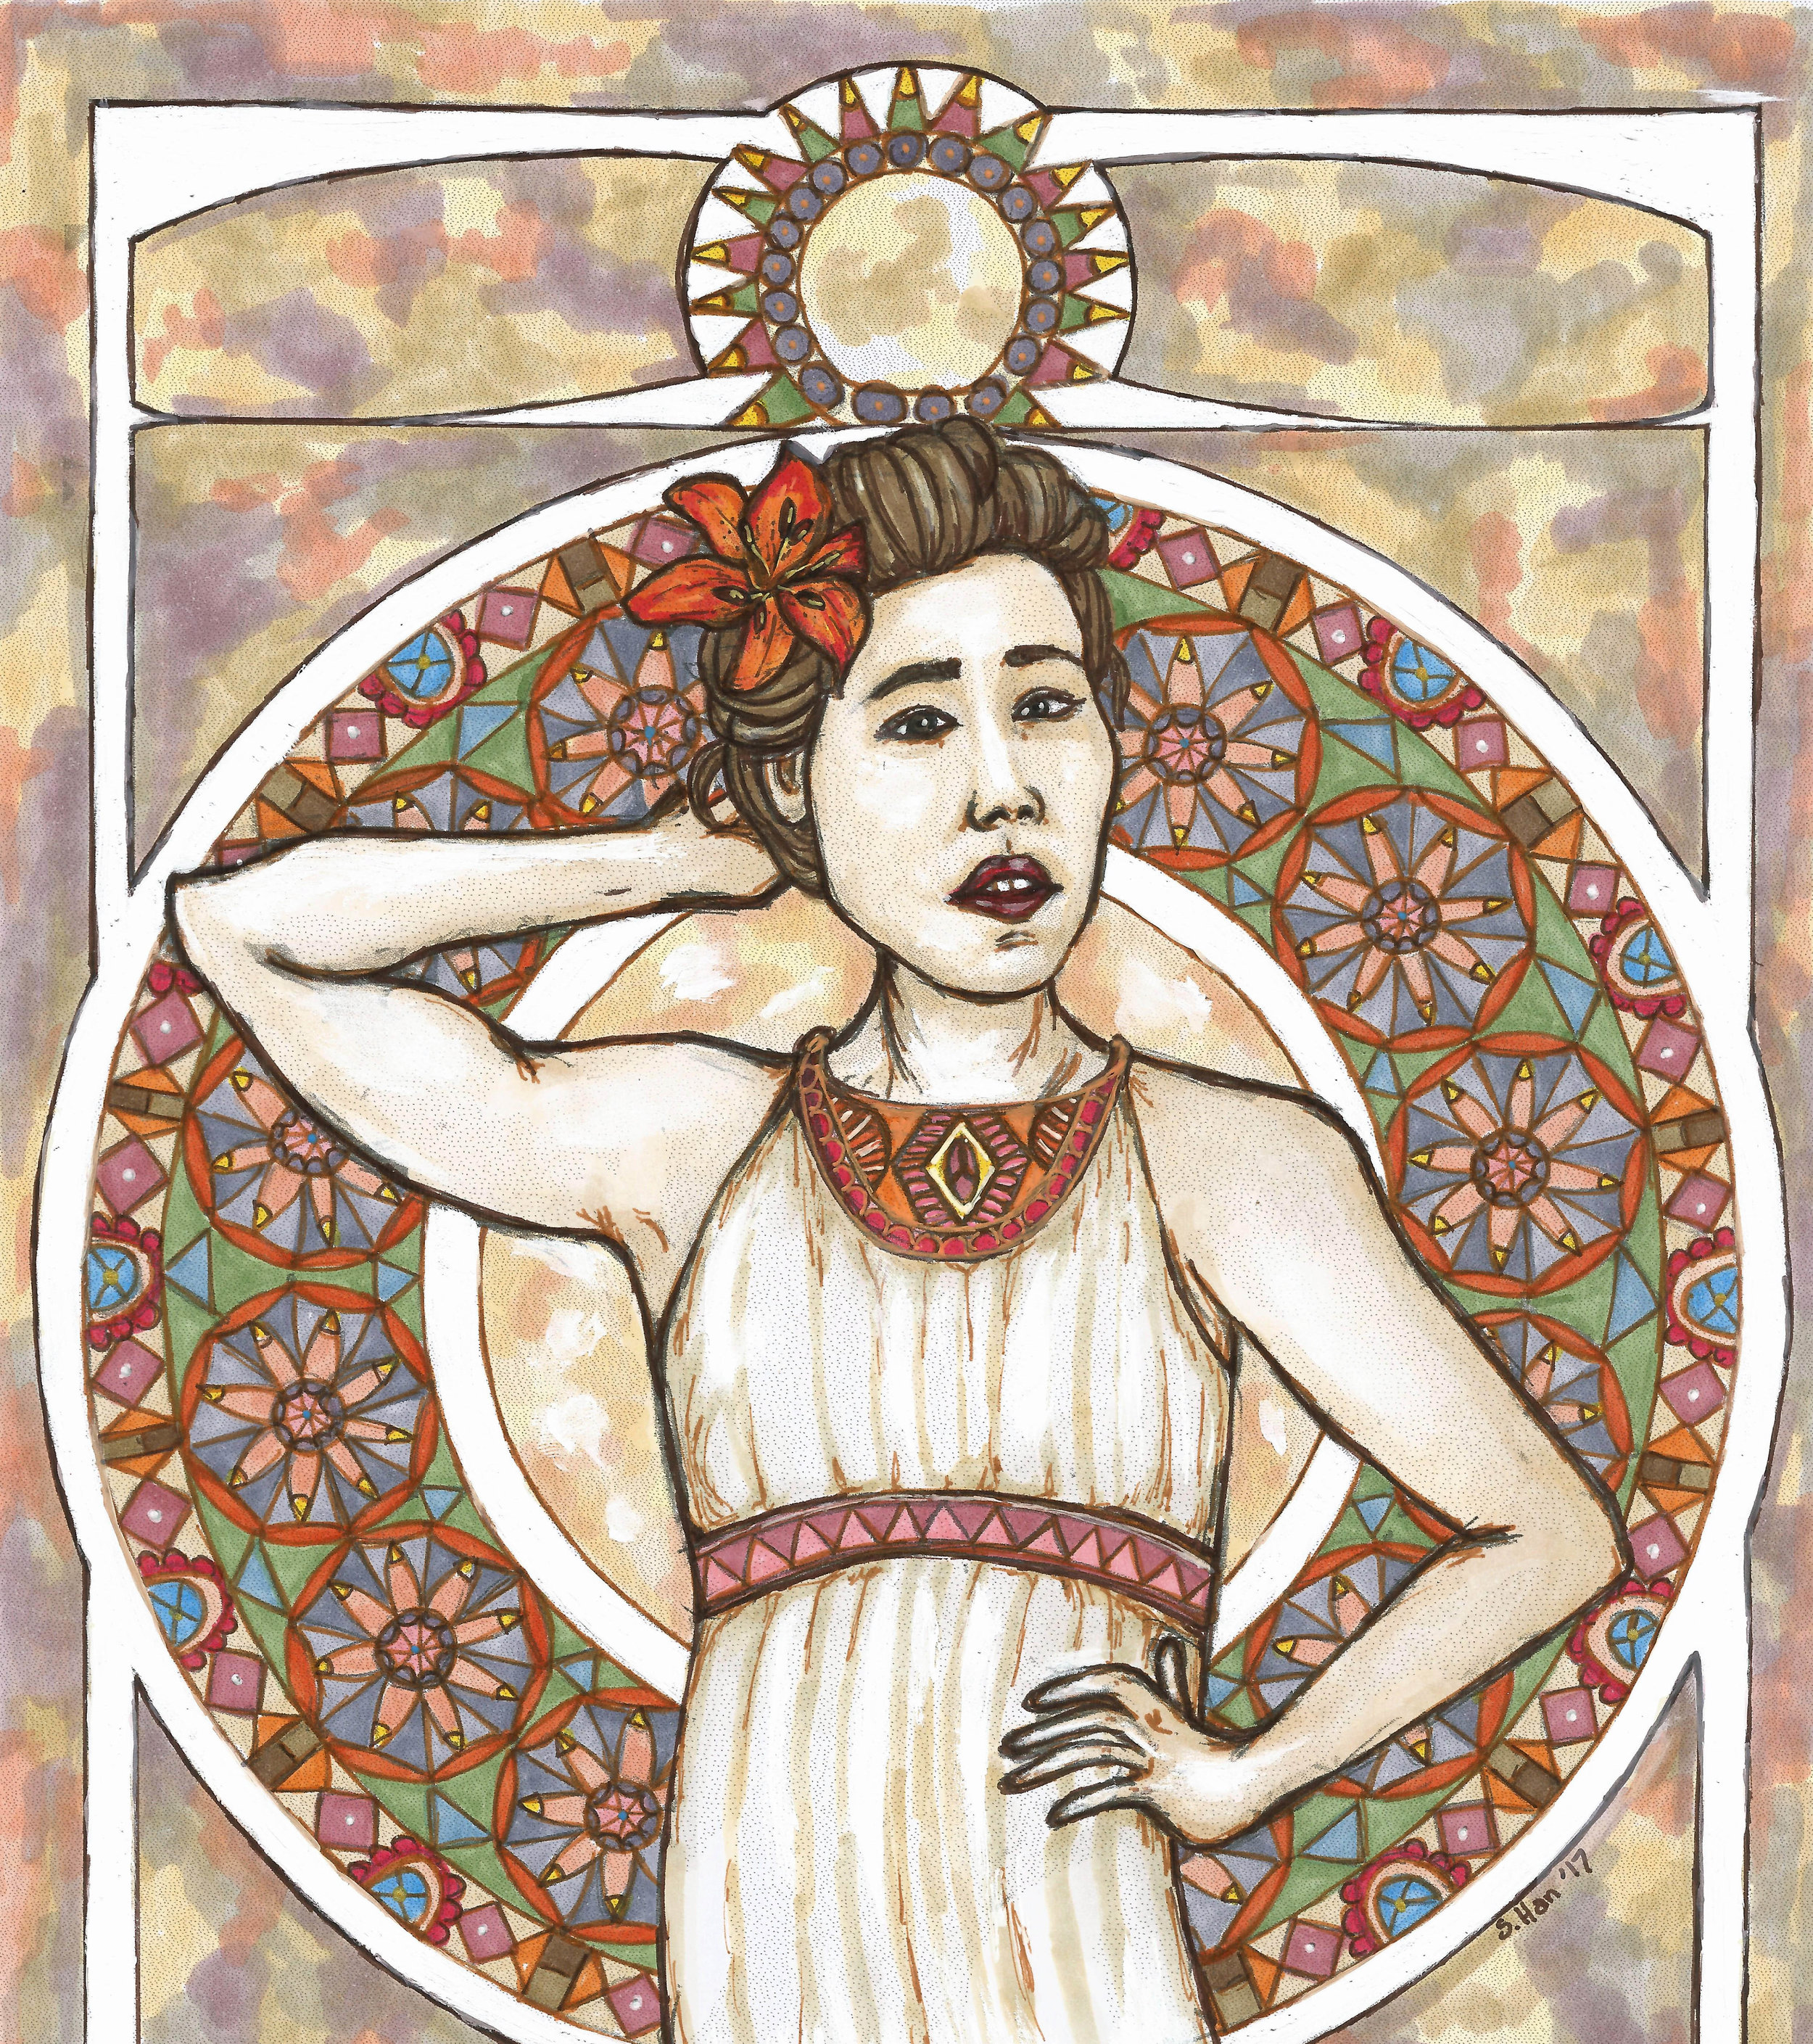 Mucha inspired self portrait